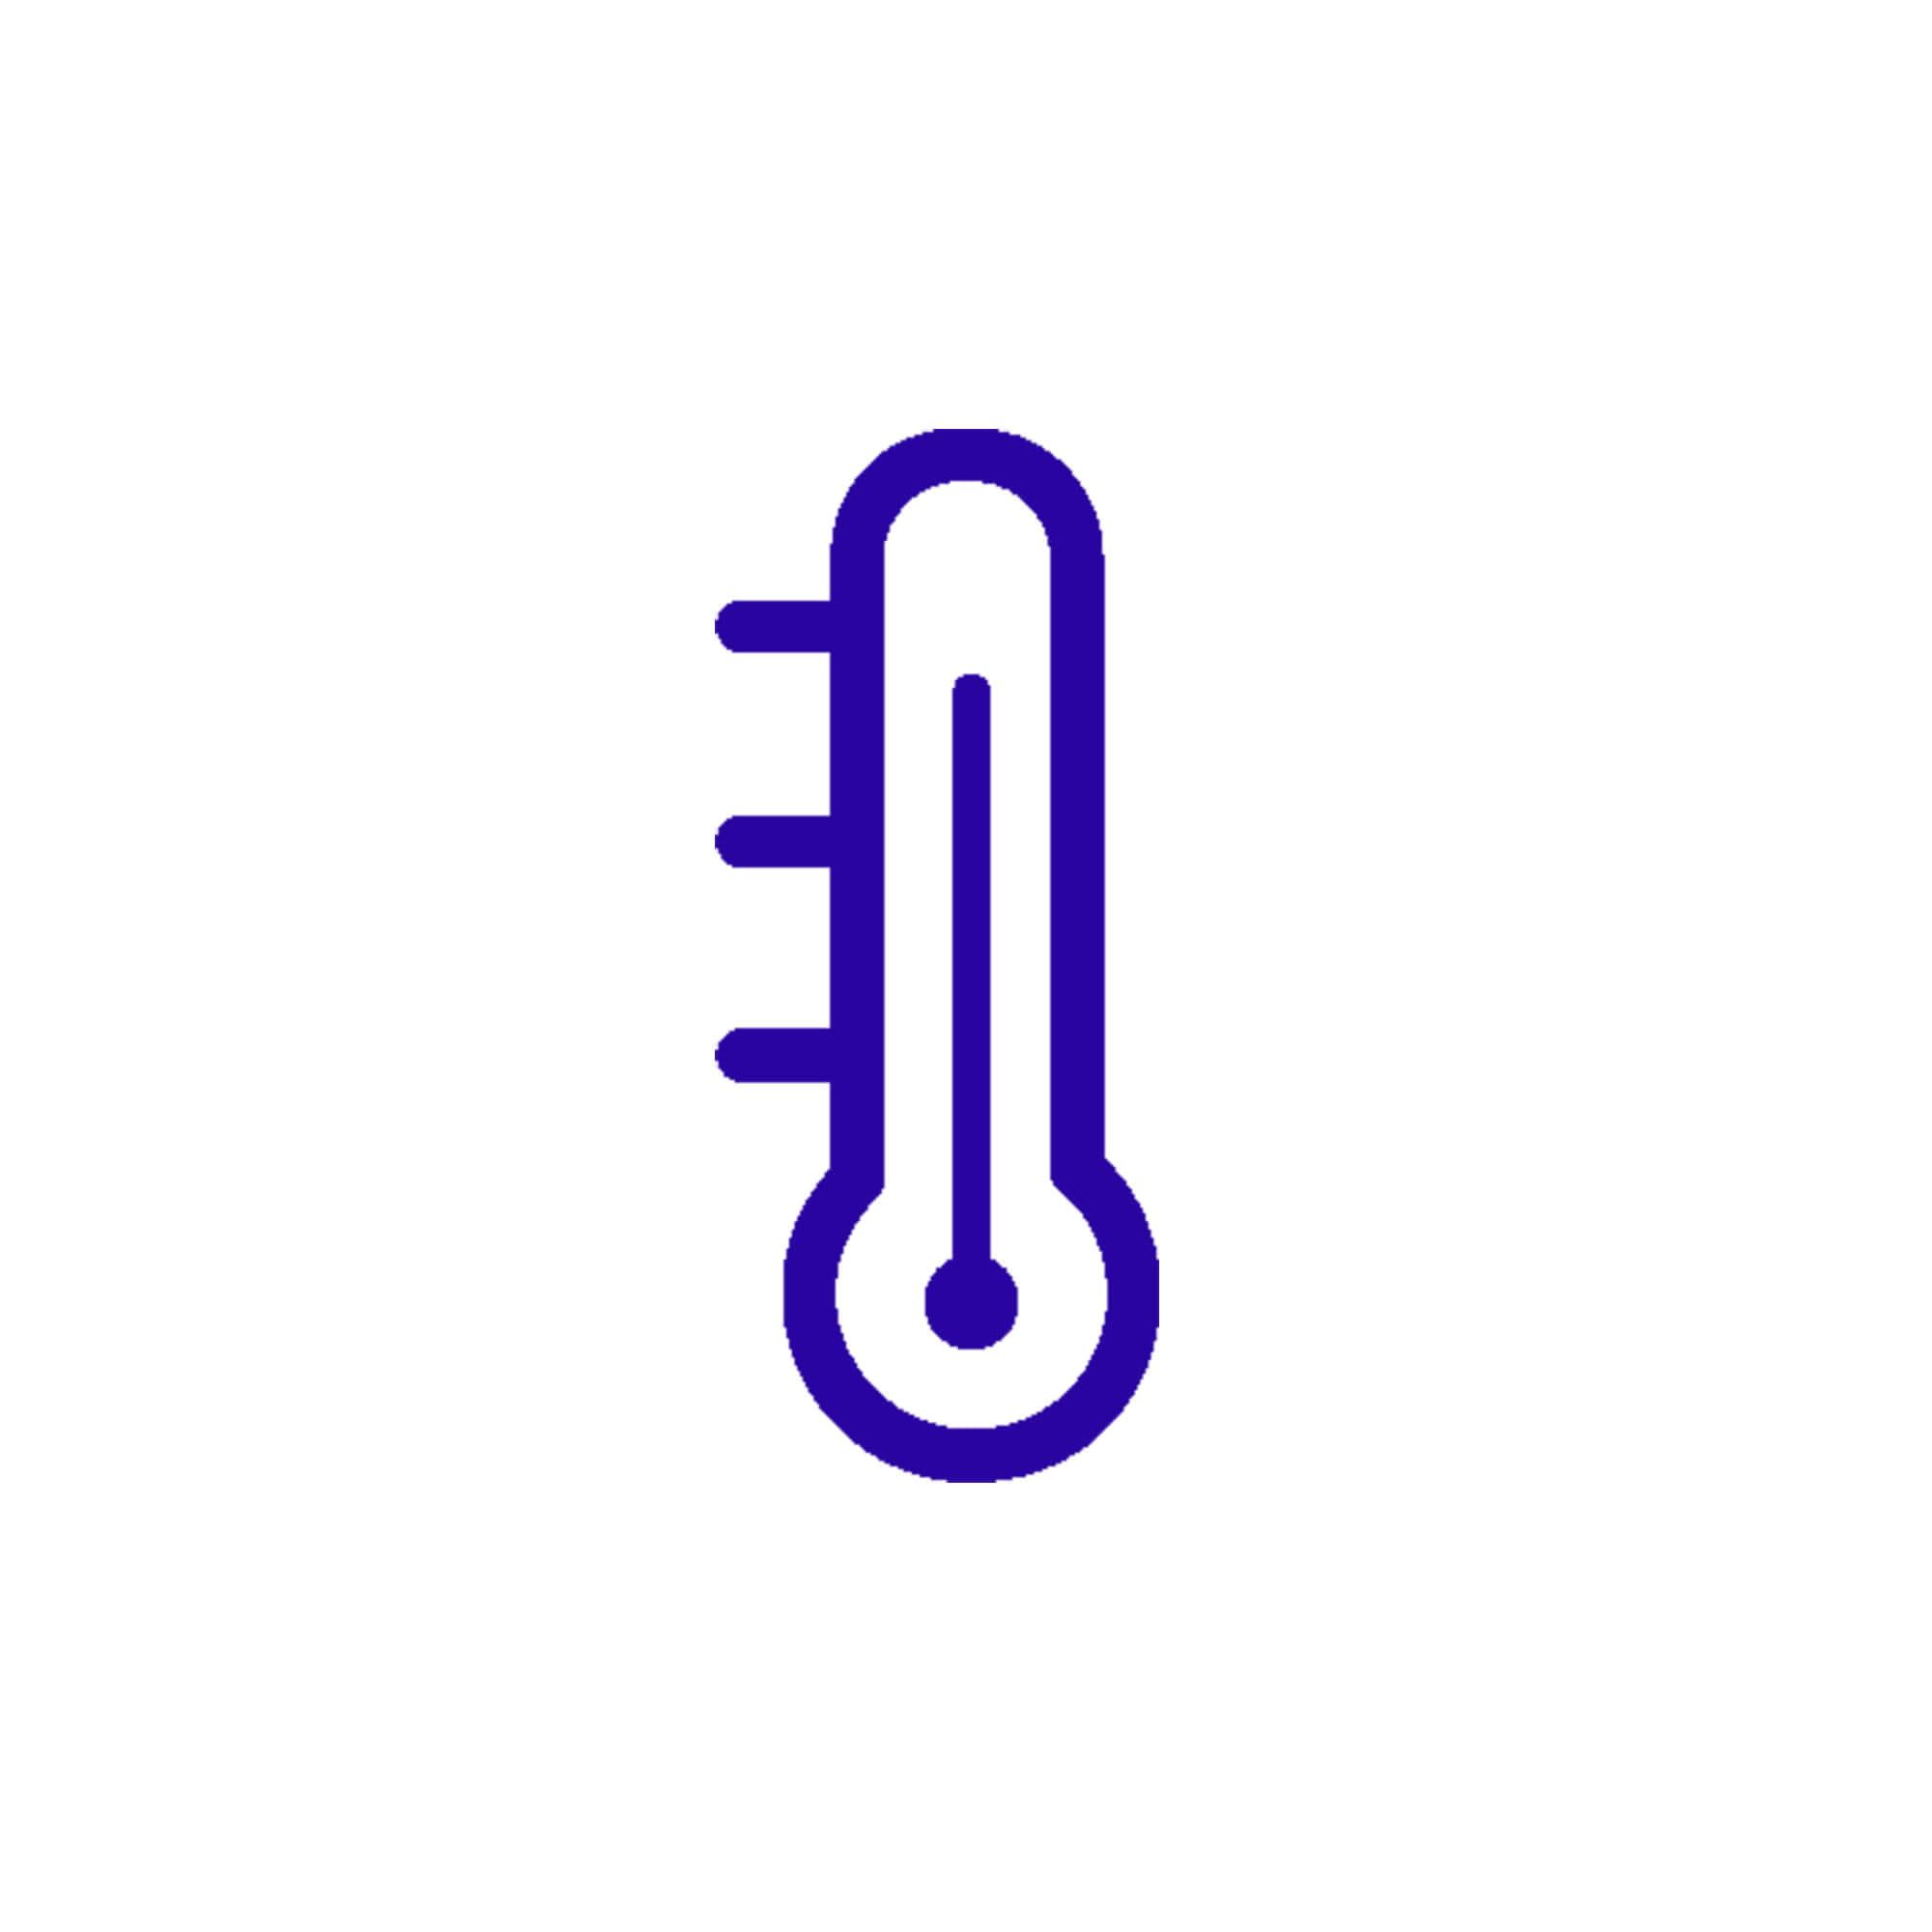 icône de température